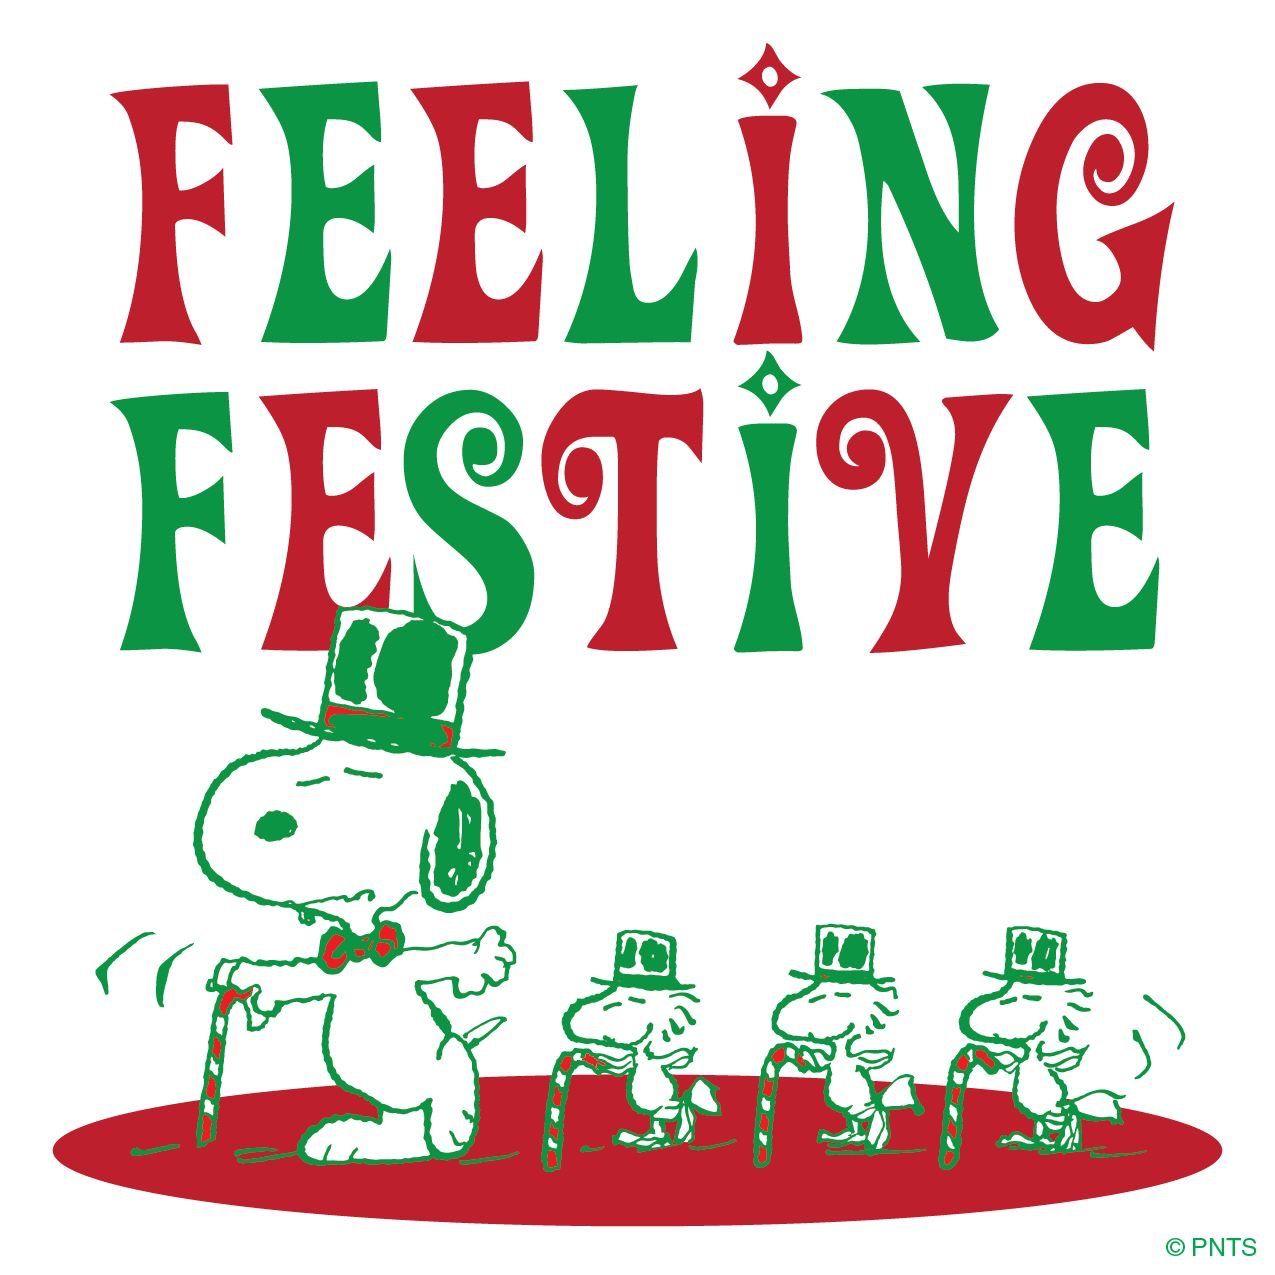 Not ready to stop celebrating yet 🎄 | Peanuts | Pinterest | Snoopy ...